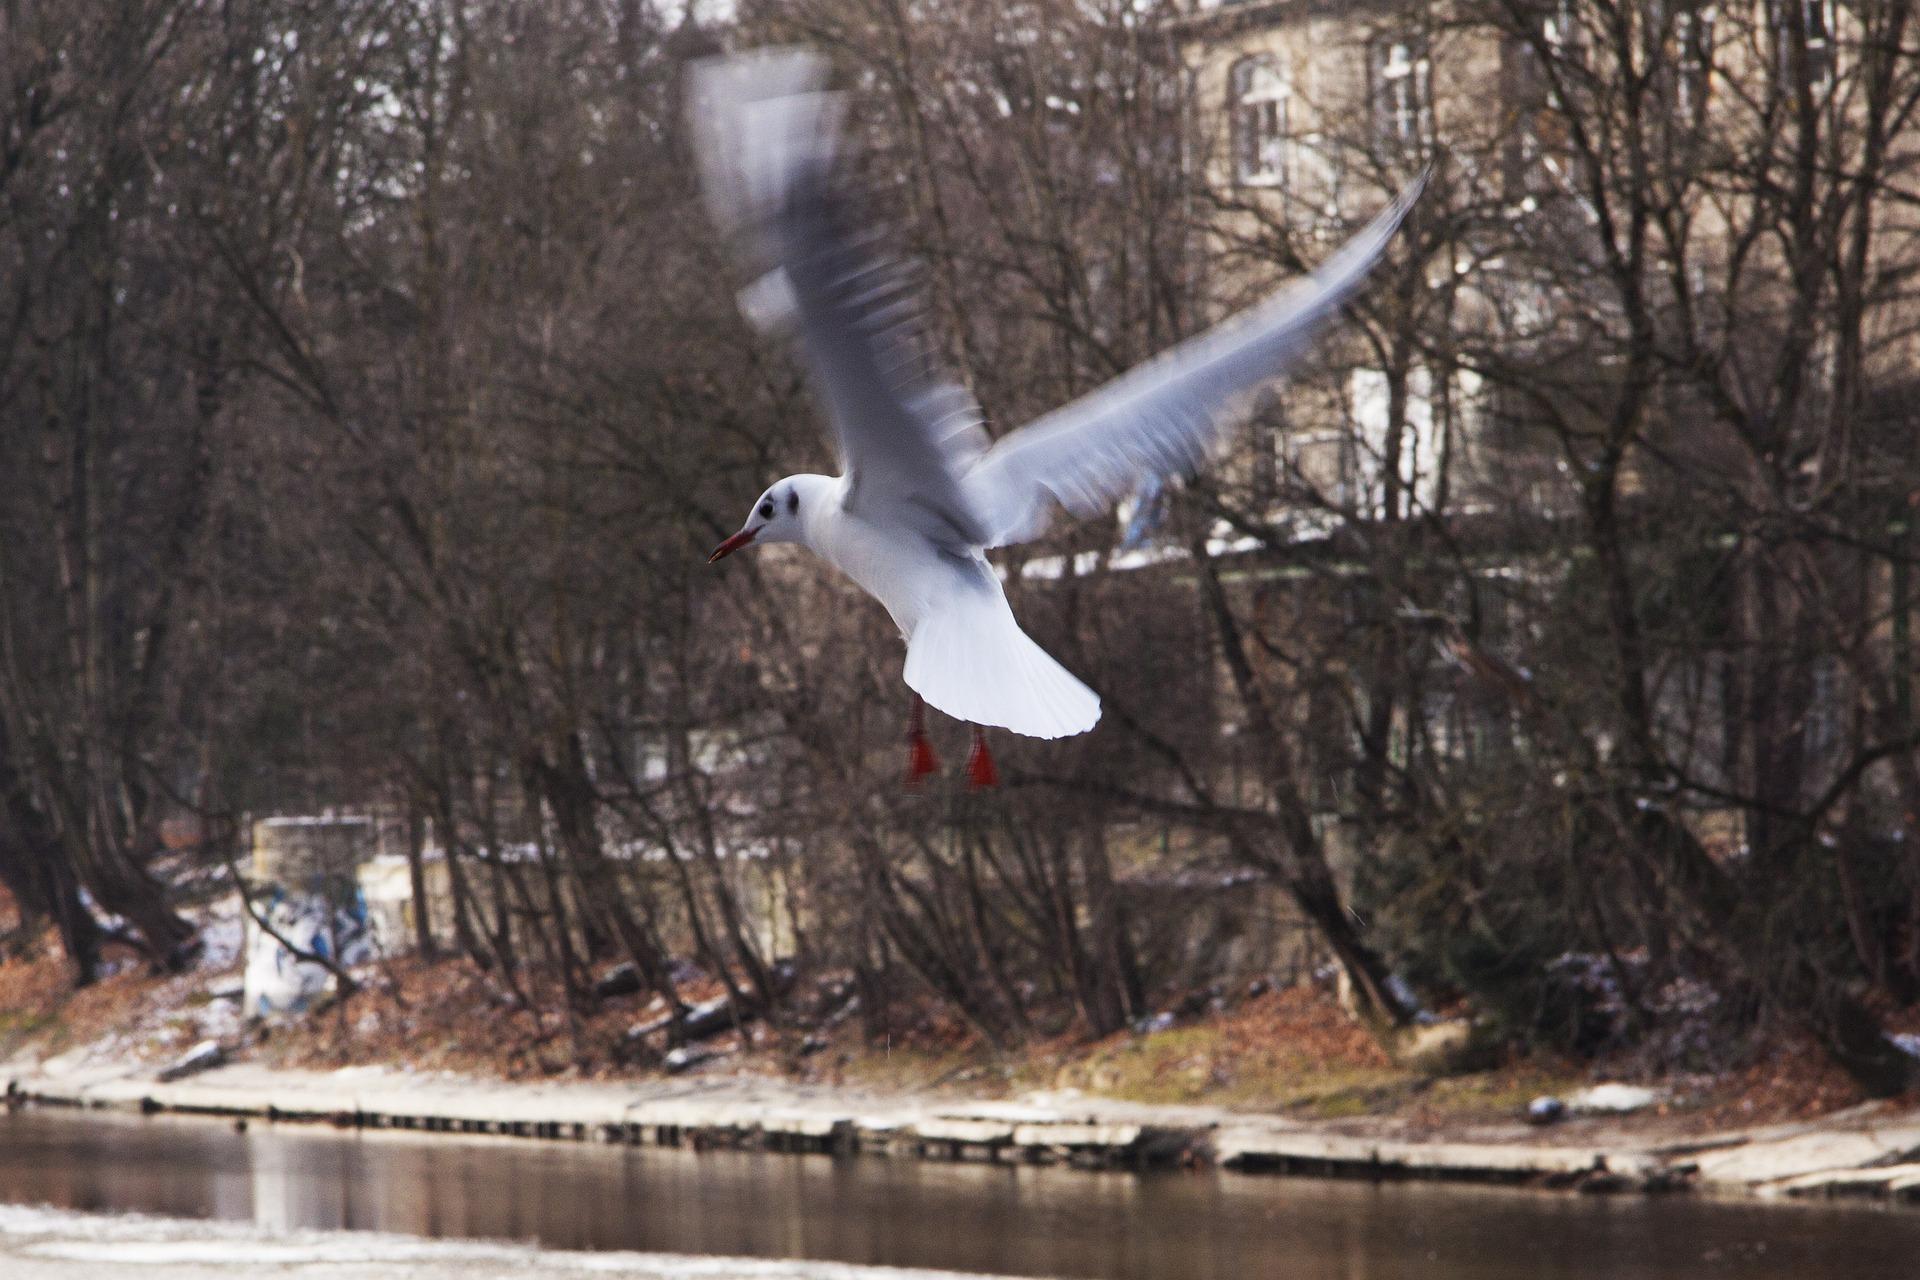 Seagull Flying, Animal, Bird, Gull, Nature, HQ Photo